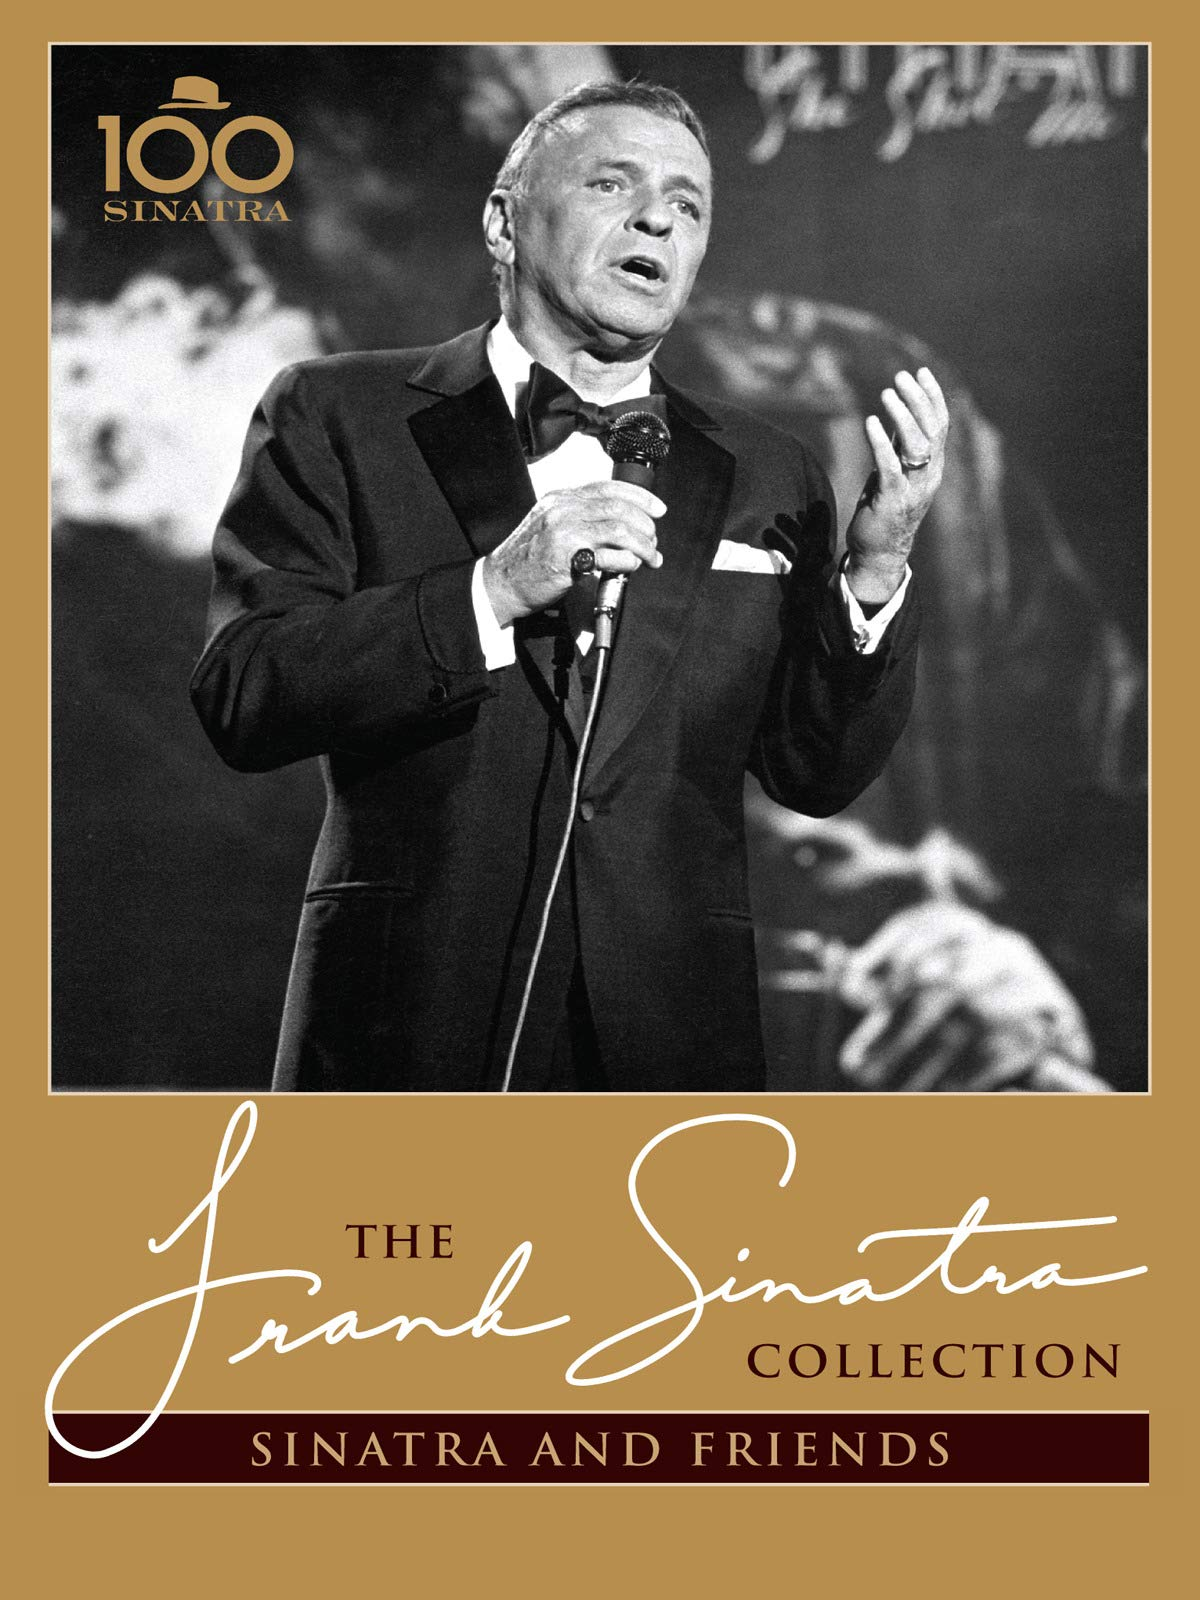 Frank Sinatra - Sinatra & Friends on Amazon Prime Instant Video UK